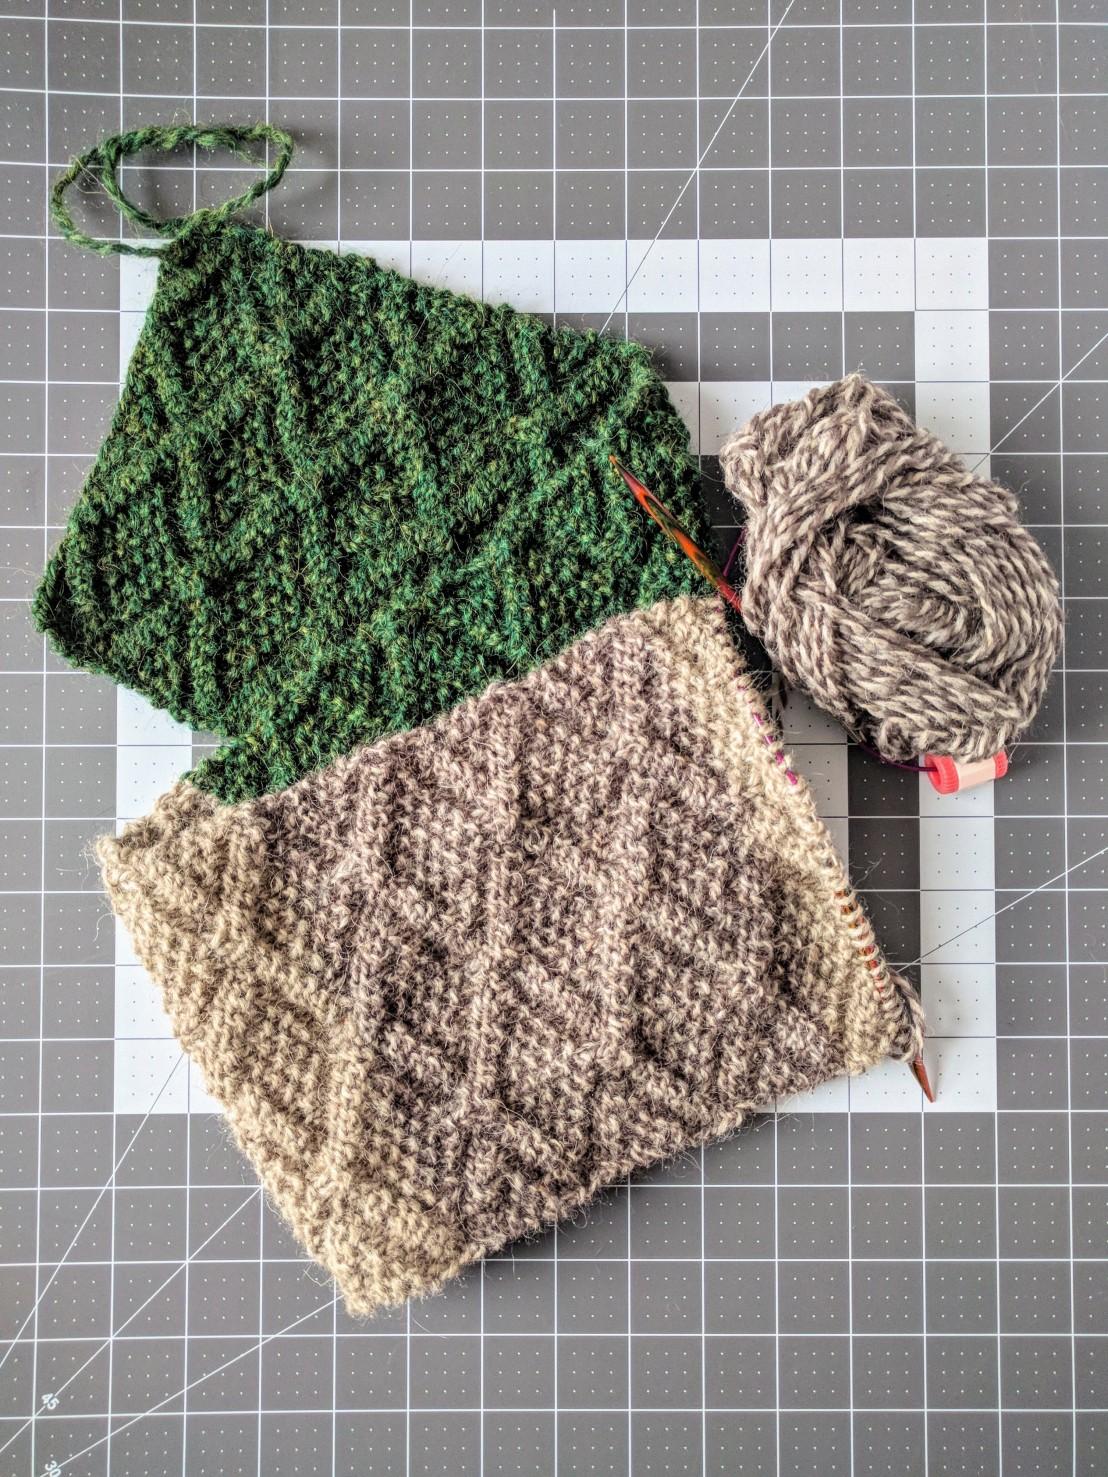 Diamond scarf knitting project in progress